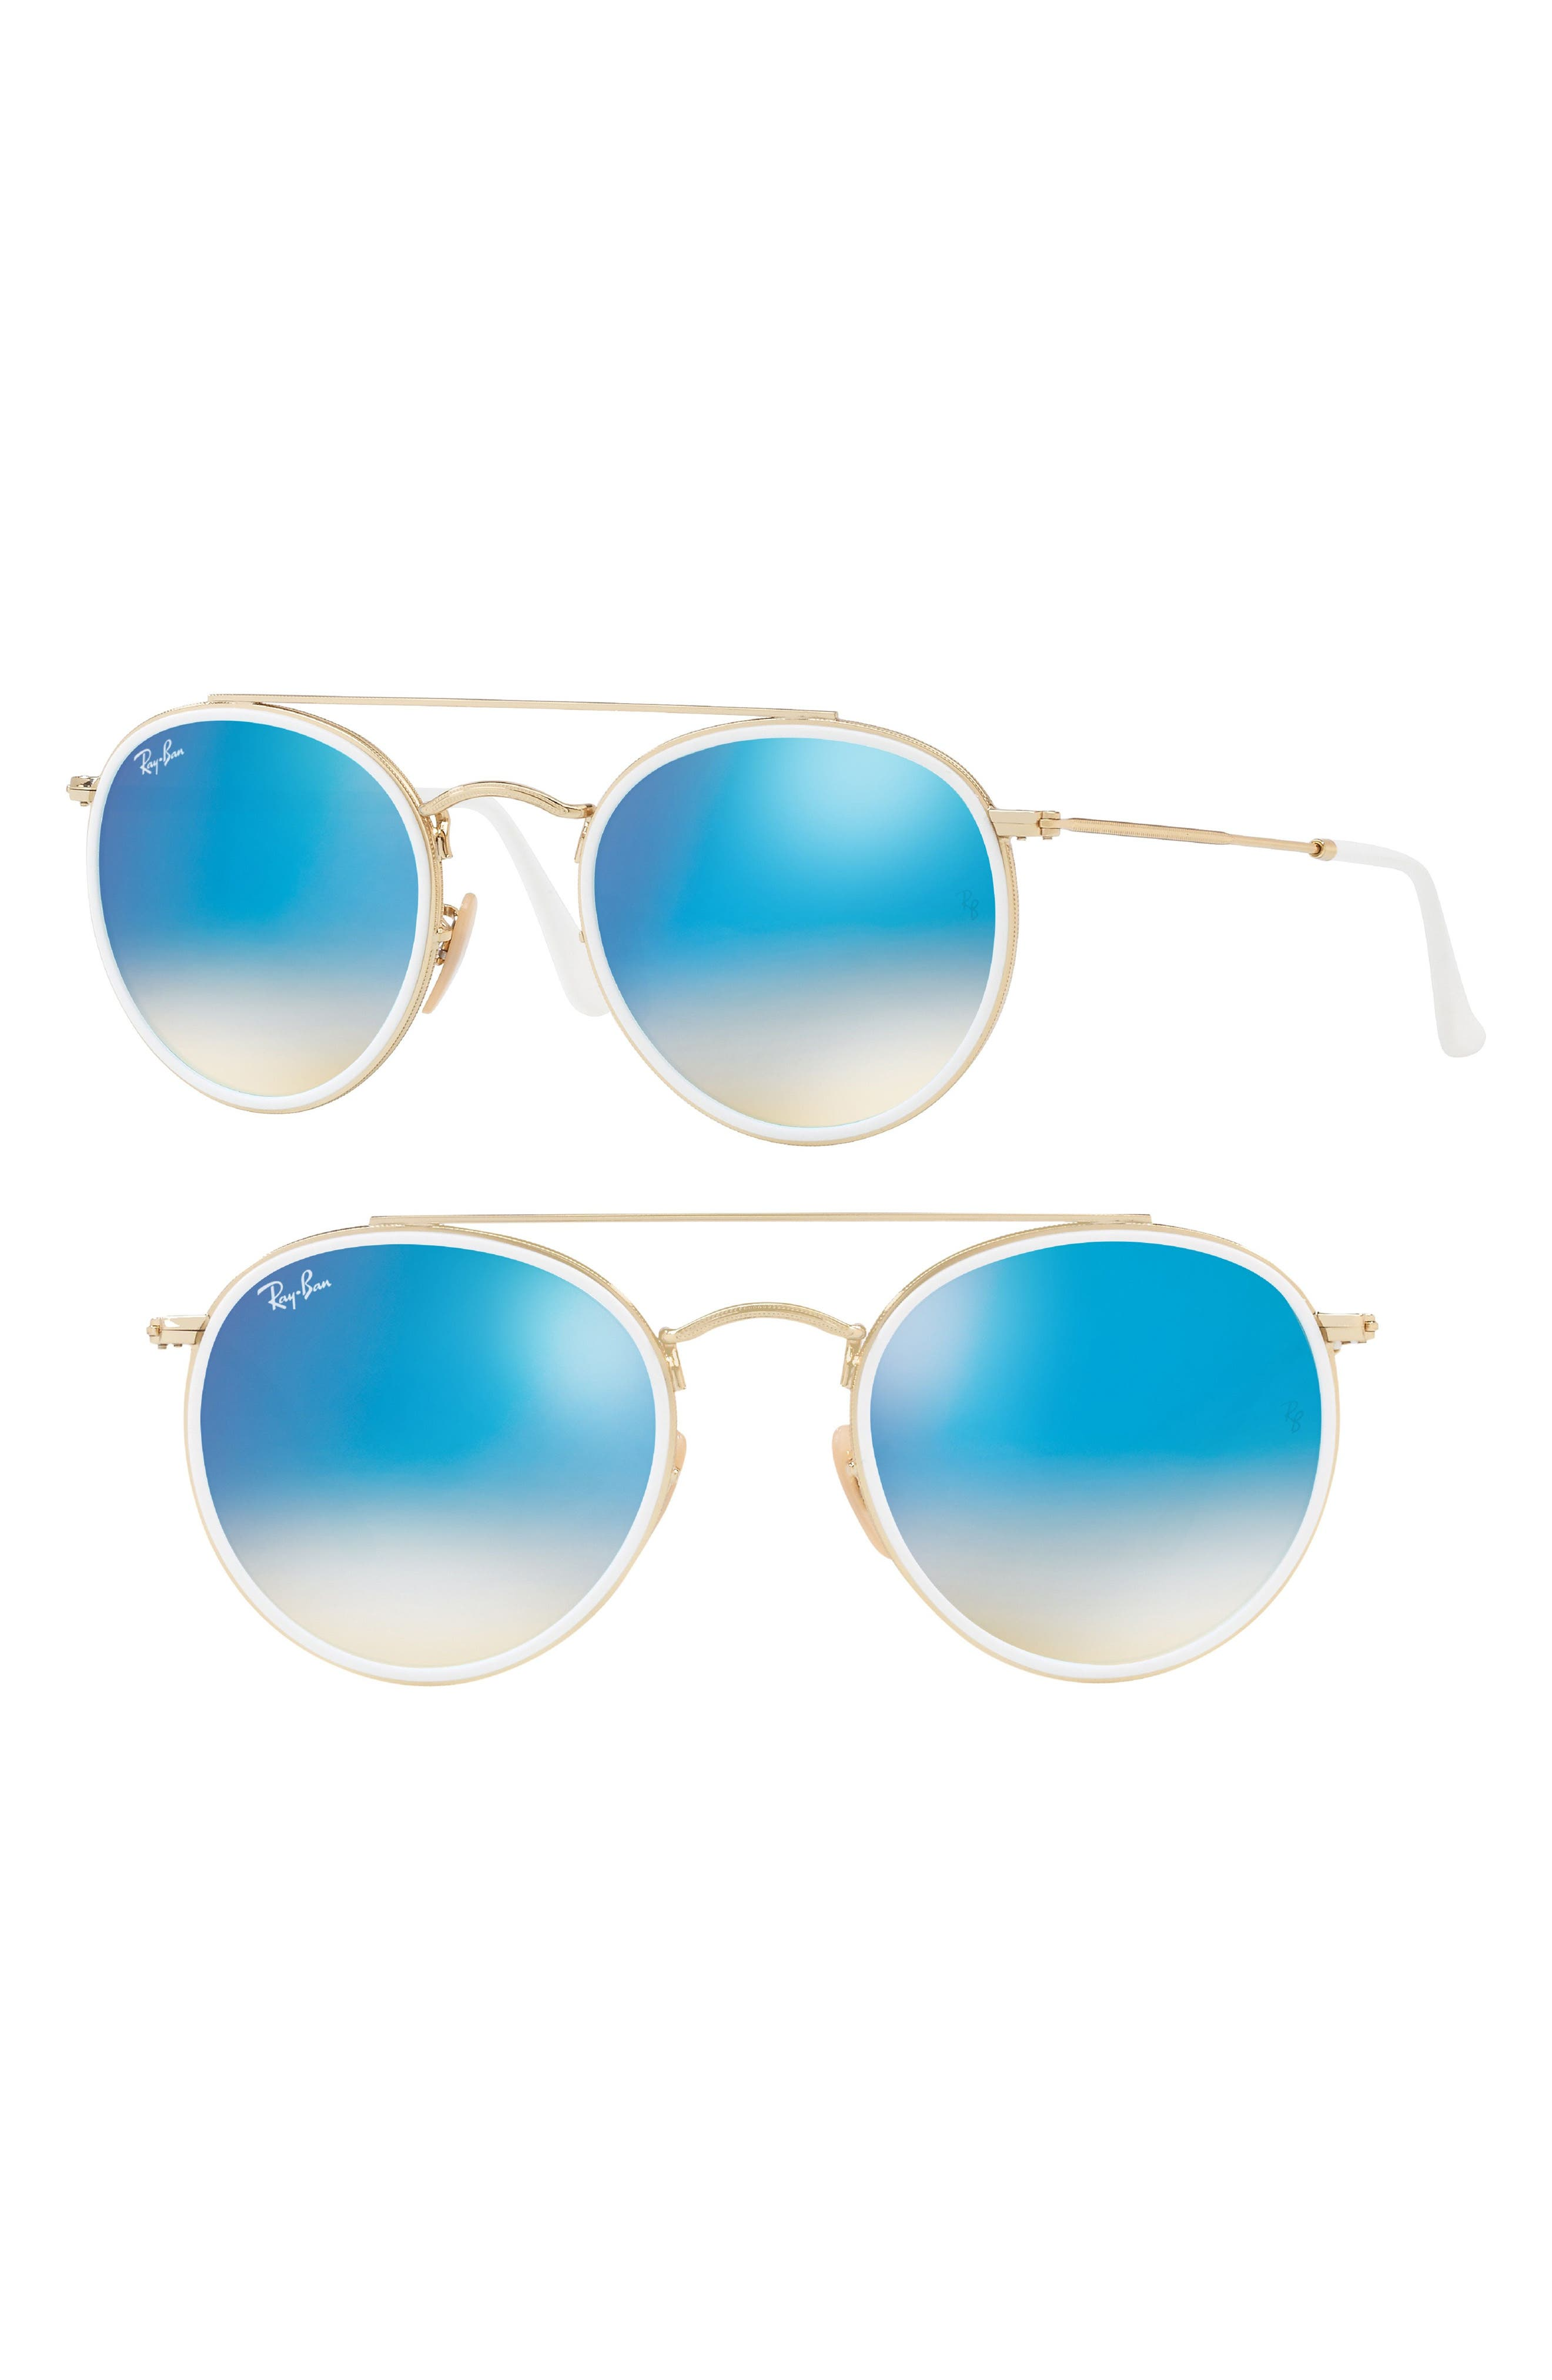 51mm Sunglasses,                         Main,                         color, 715